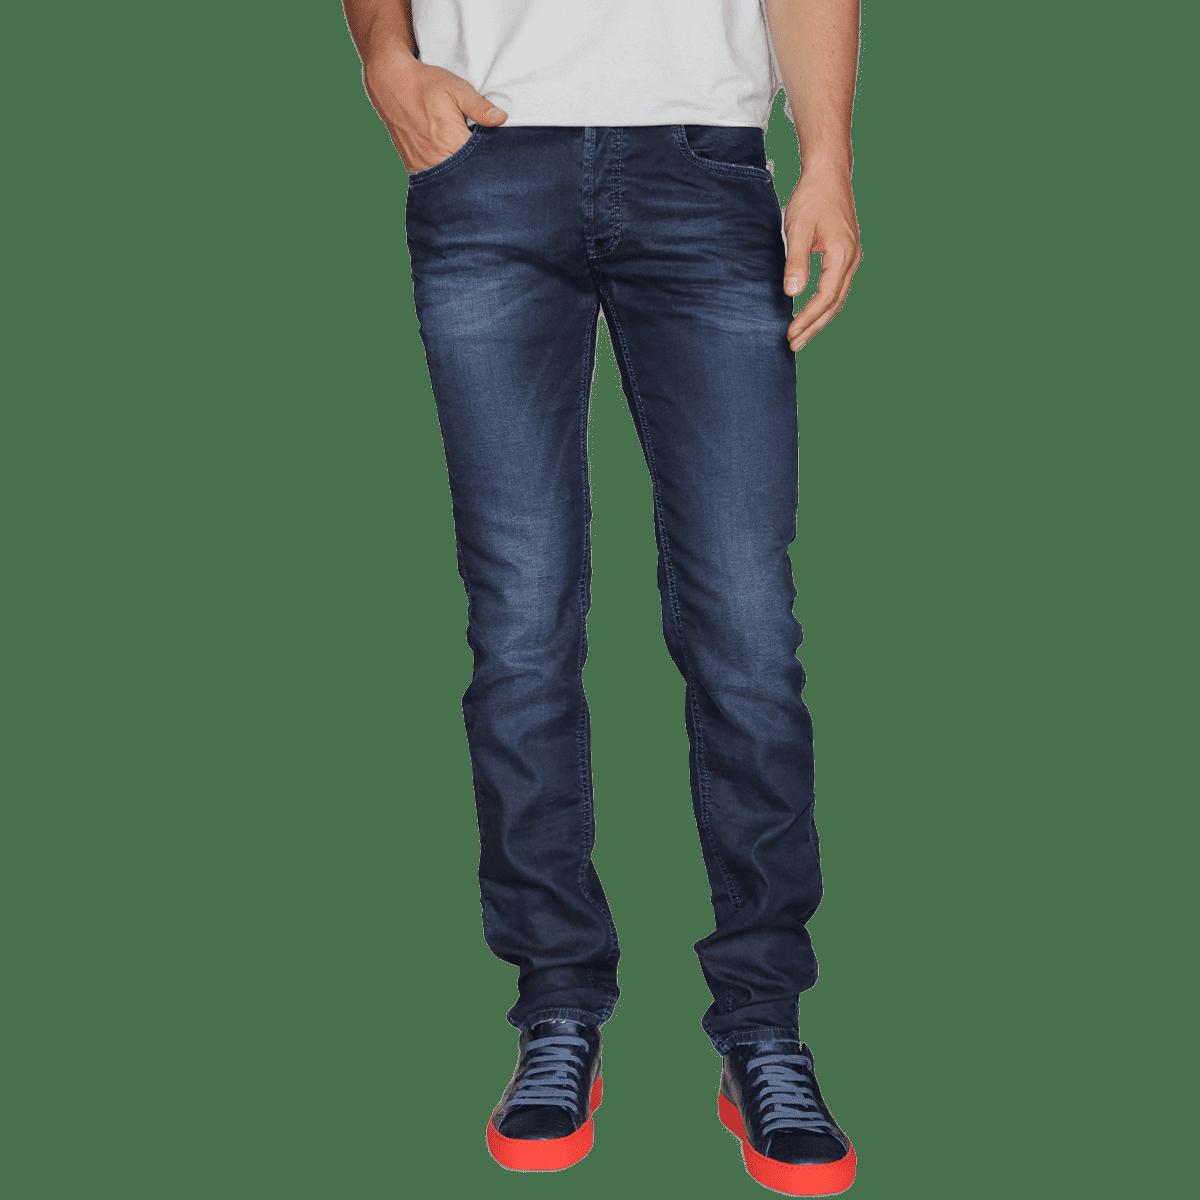 Cabinero Stiles Berlin PG Enjoy Jeans, Herrenhosen, made in Italy AW17-18 denim Blue-Blue 17-5